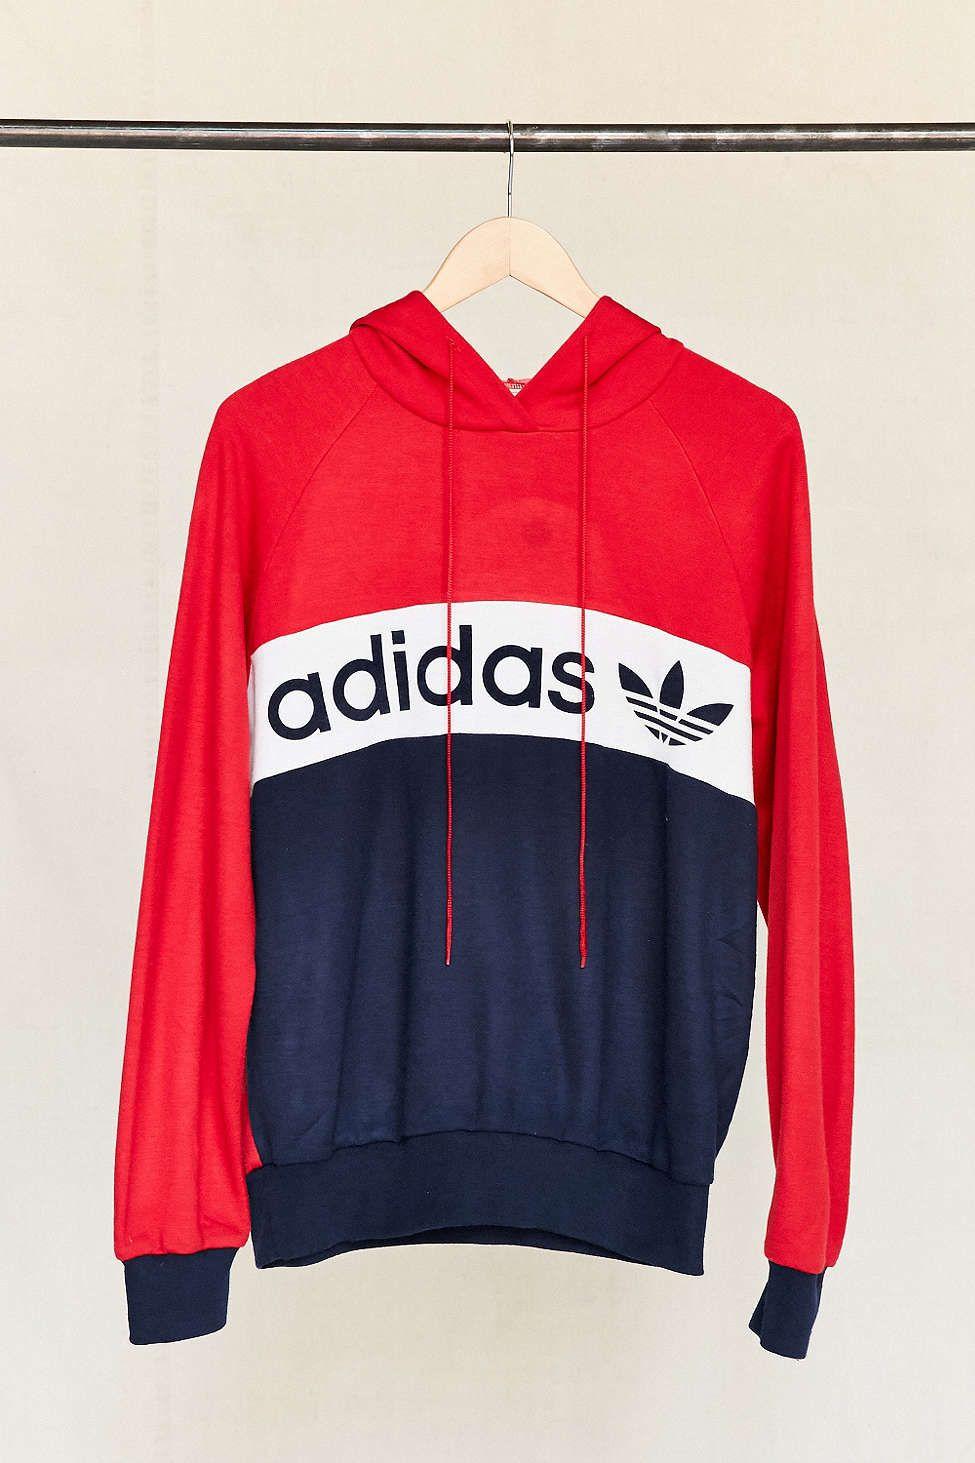 Adidas Originals Colorblock Hoodie Sweatshirt Sweatshirts Hoodie Sweatshirts Hoodies [ 2175 x 1450 Pixel ]